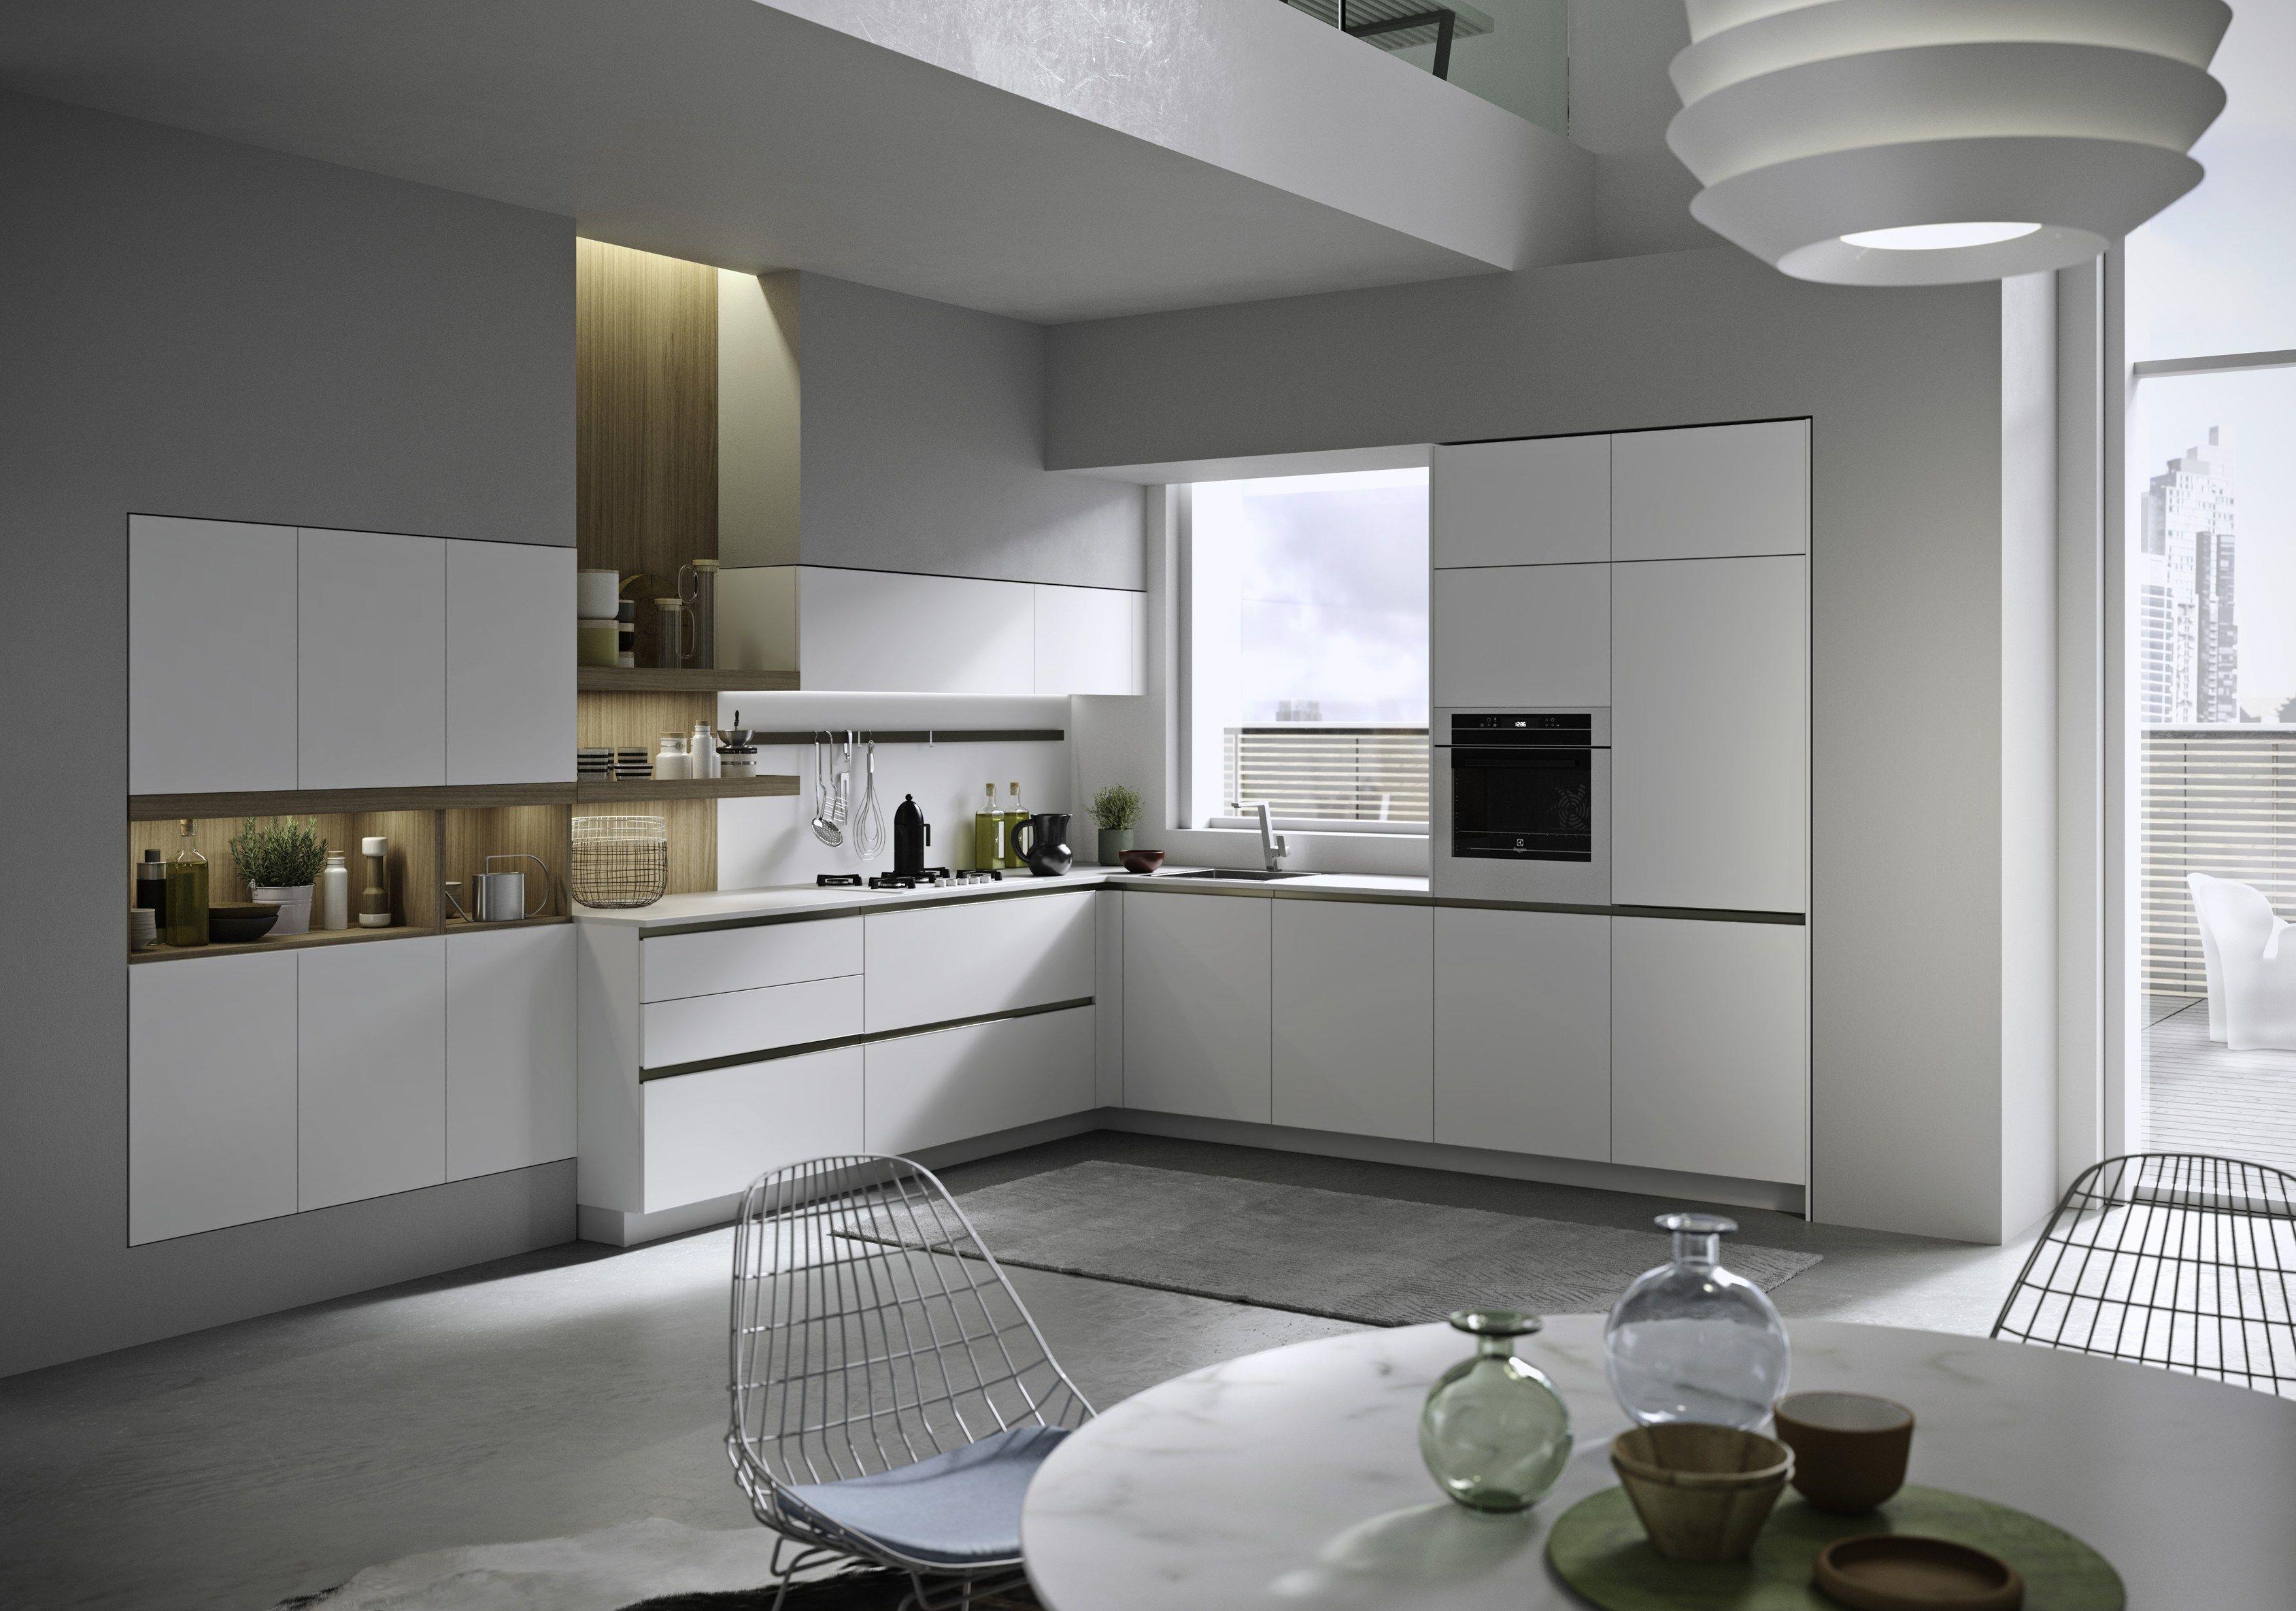 Cocina integral con tiradores integrados JOY by Snaidero diseño ...